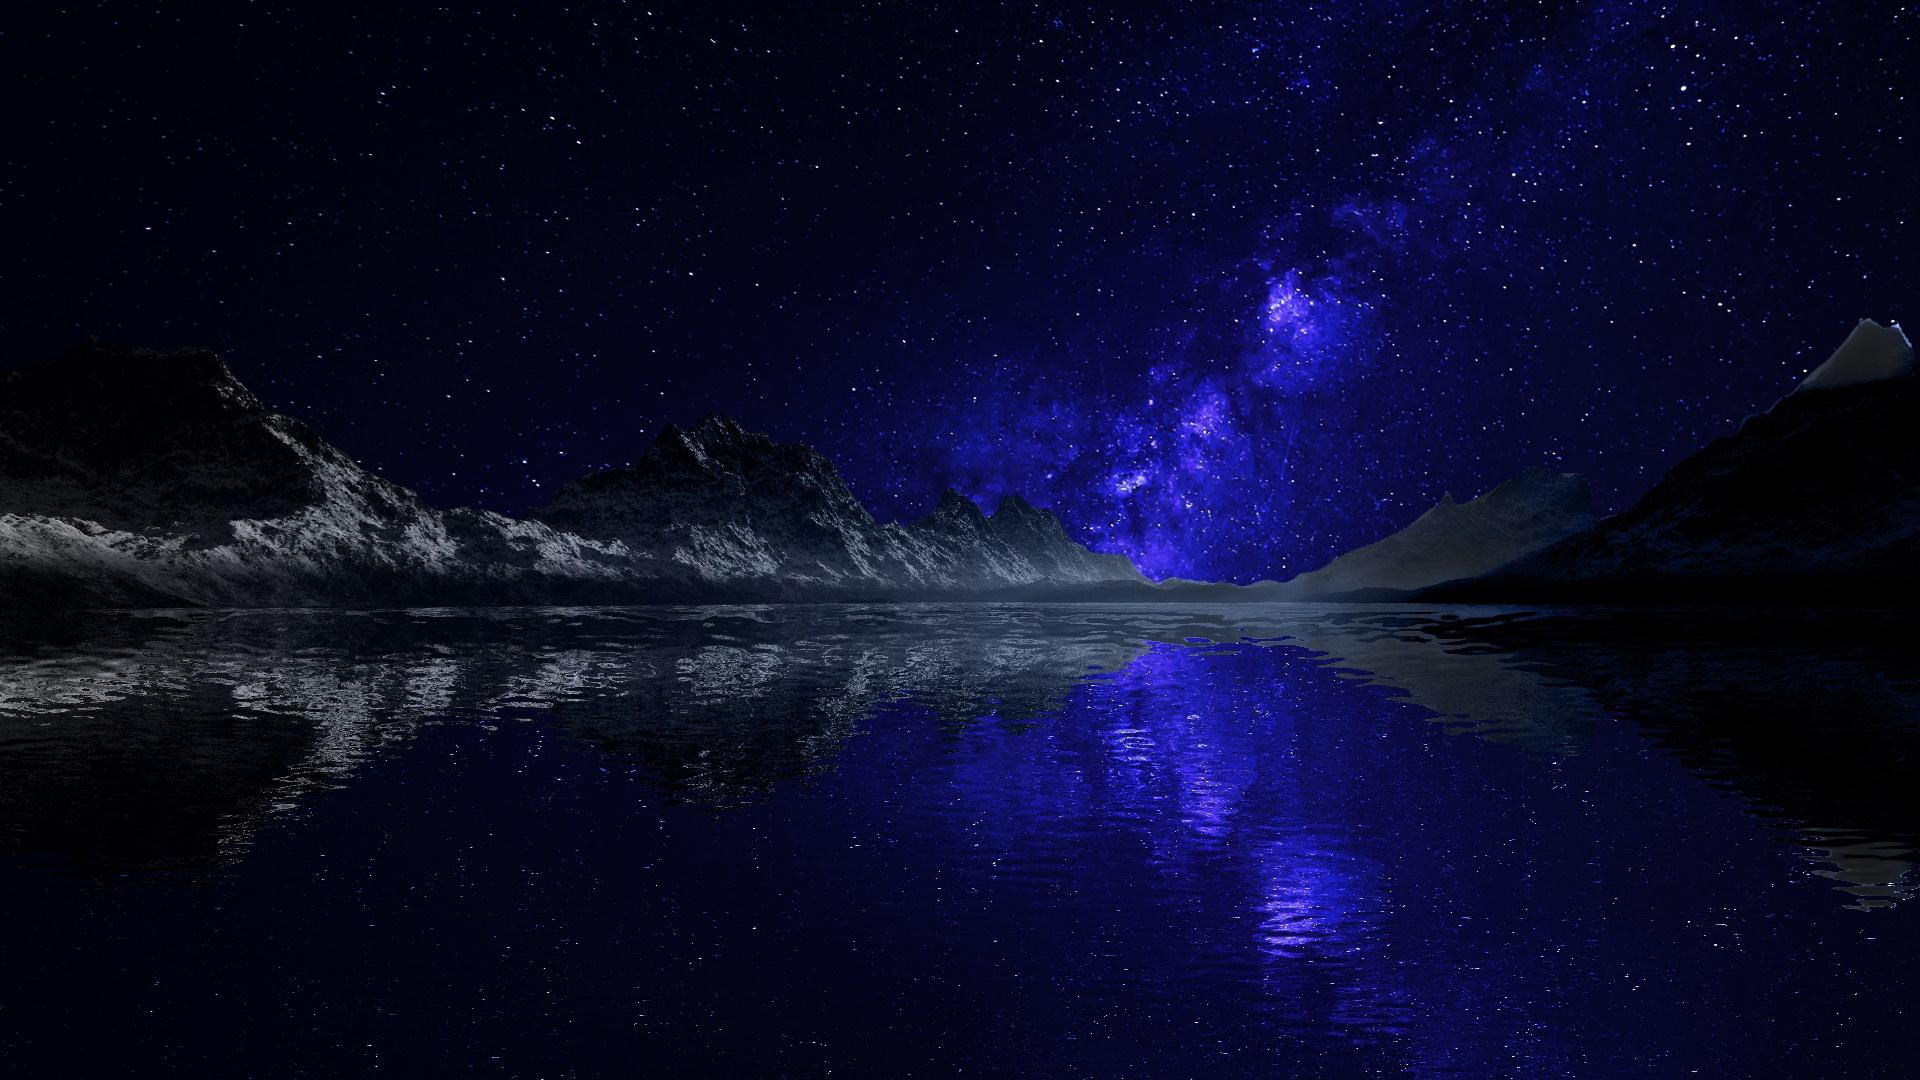 Blue Milky Way reflected wallpaper